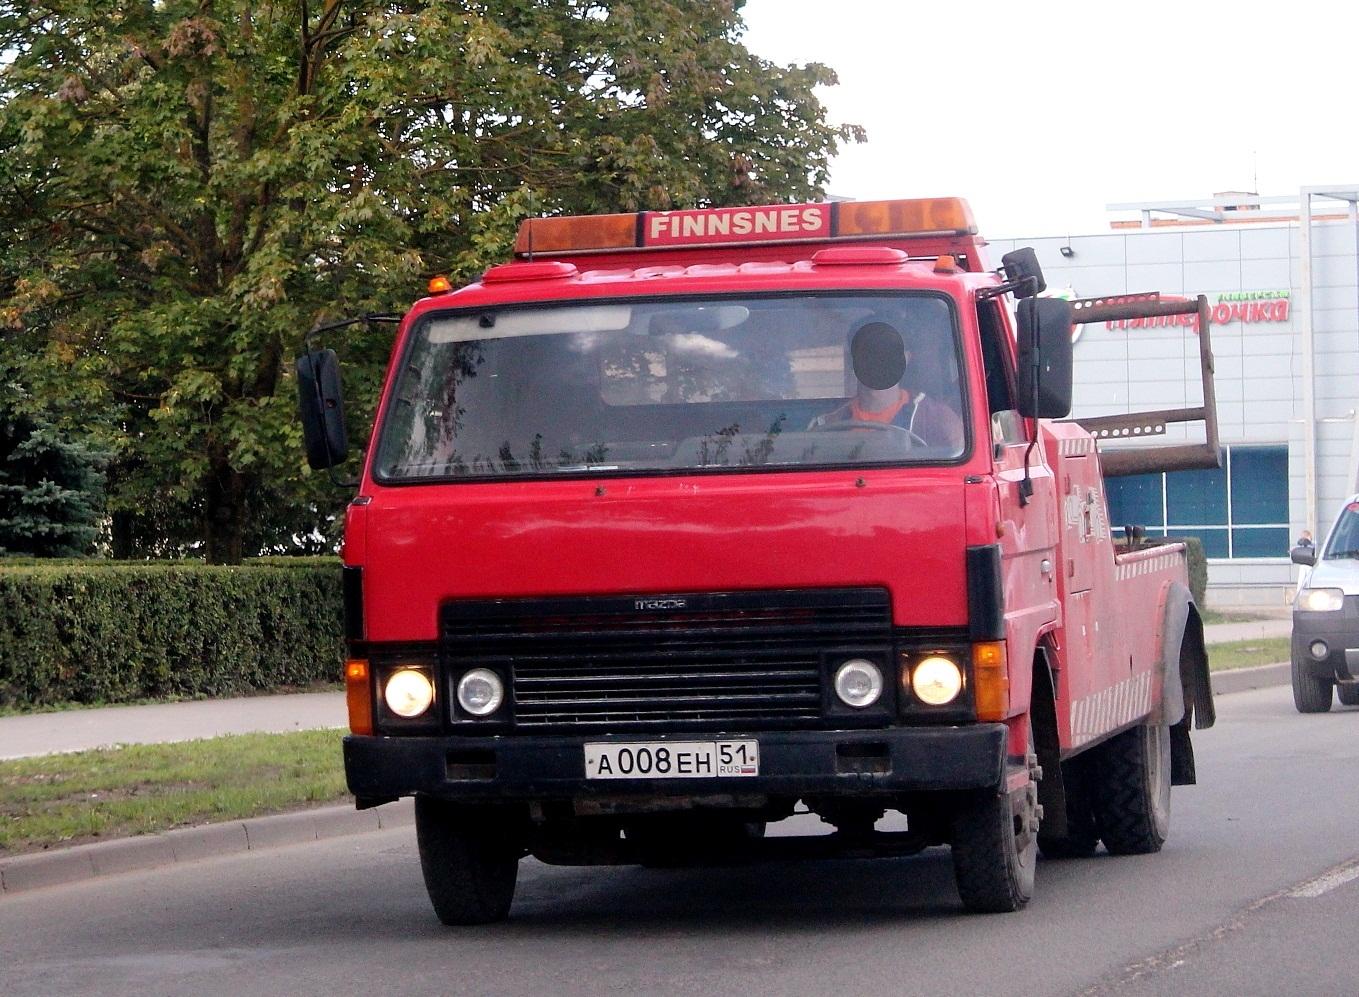 Эвакуатор на шасси Mazda T3000 #А 008 ЕН 51. Псков, улица Труда